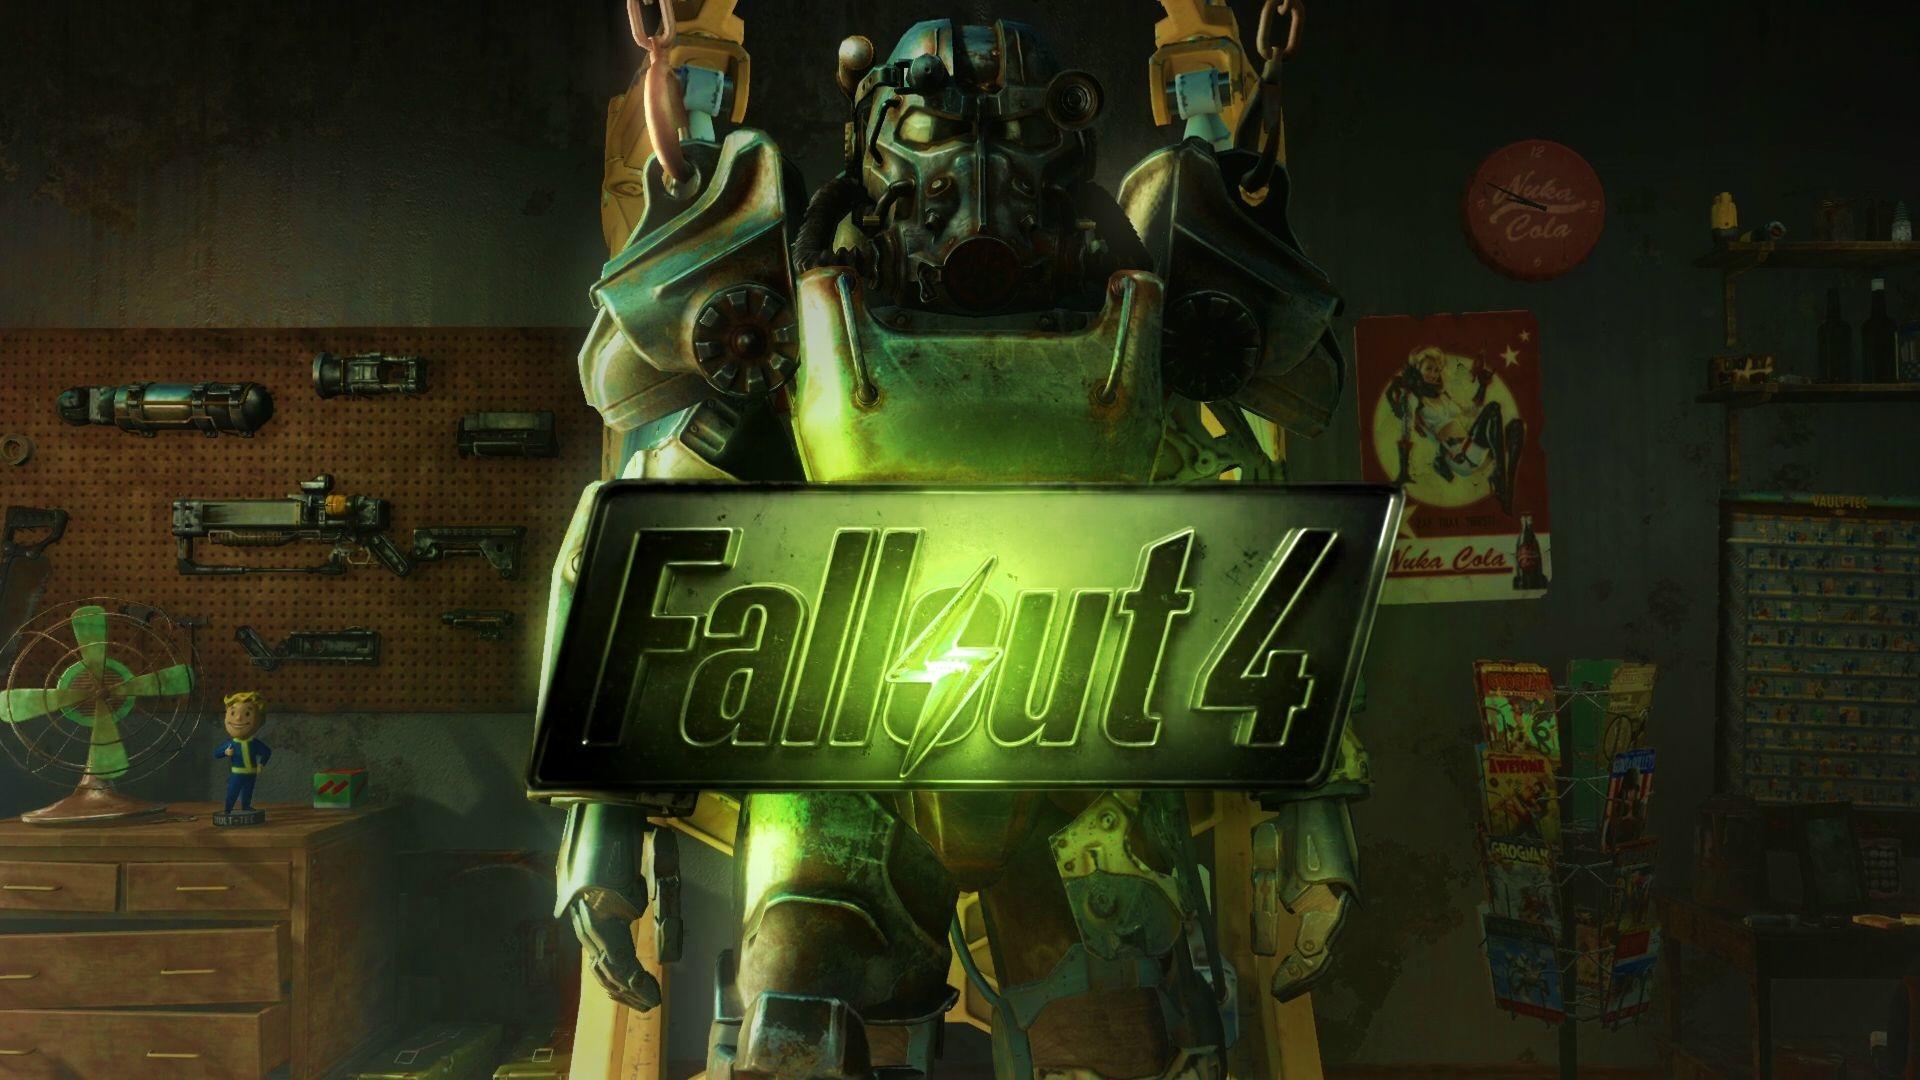 1080p Fallout 4 Wallpaper I made …